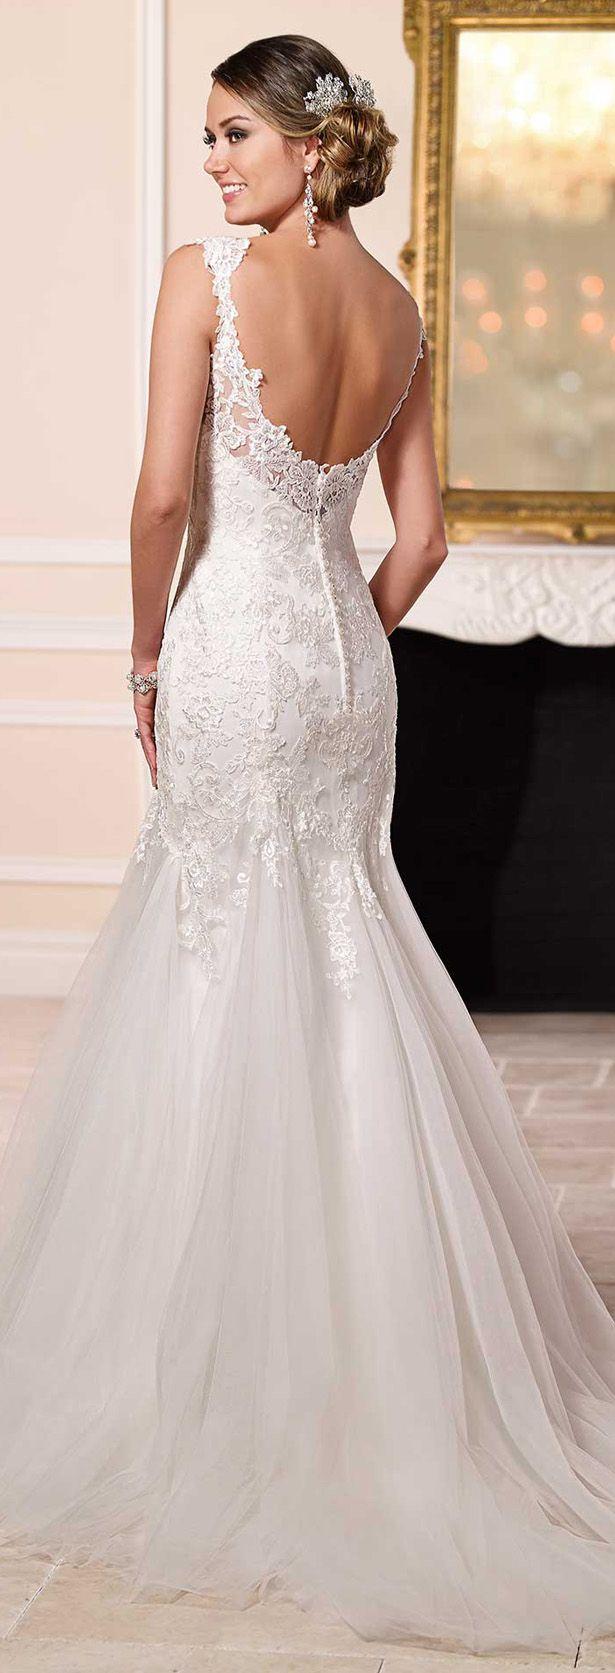 Top 10 wedding ideas and color combos from vestidos de for Stella york wedding dresses near me